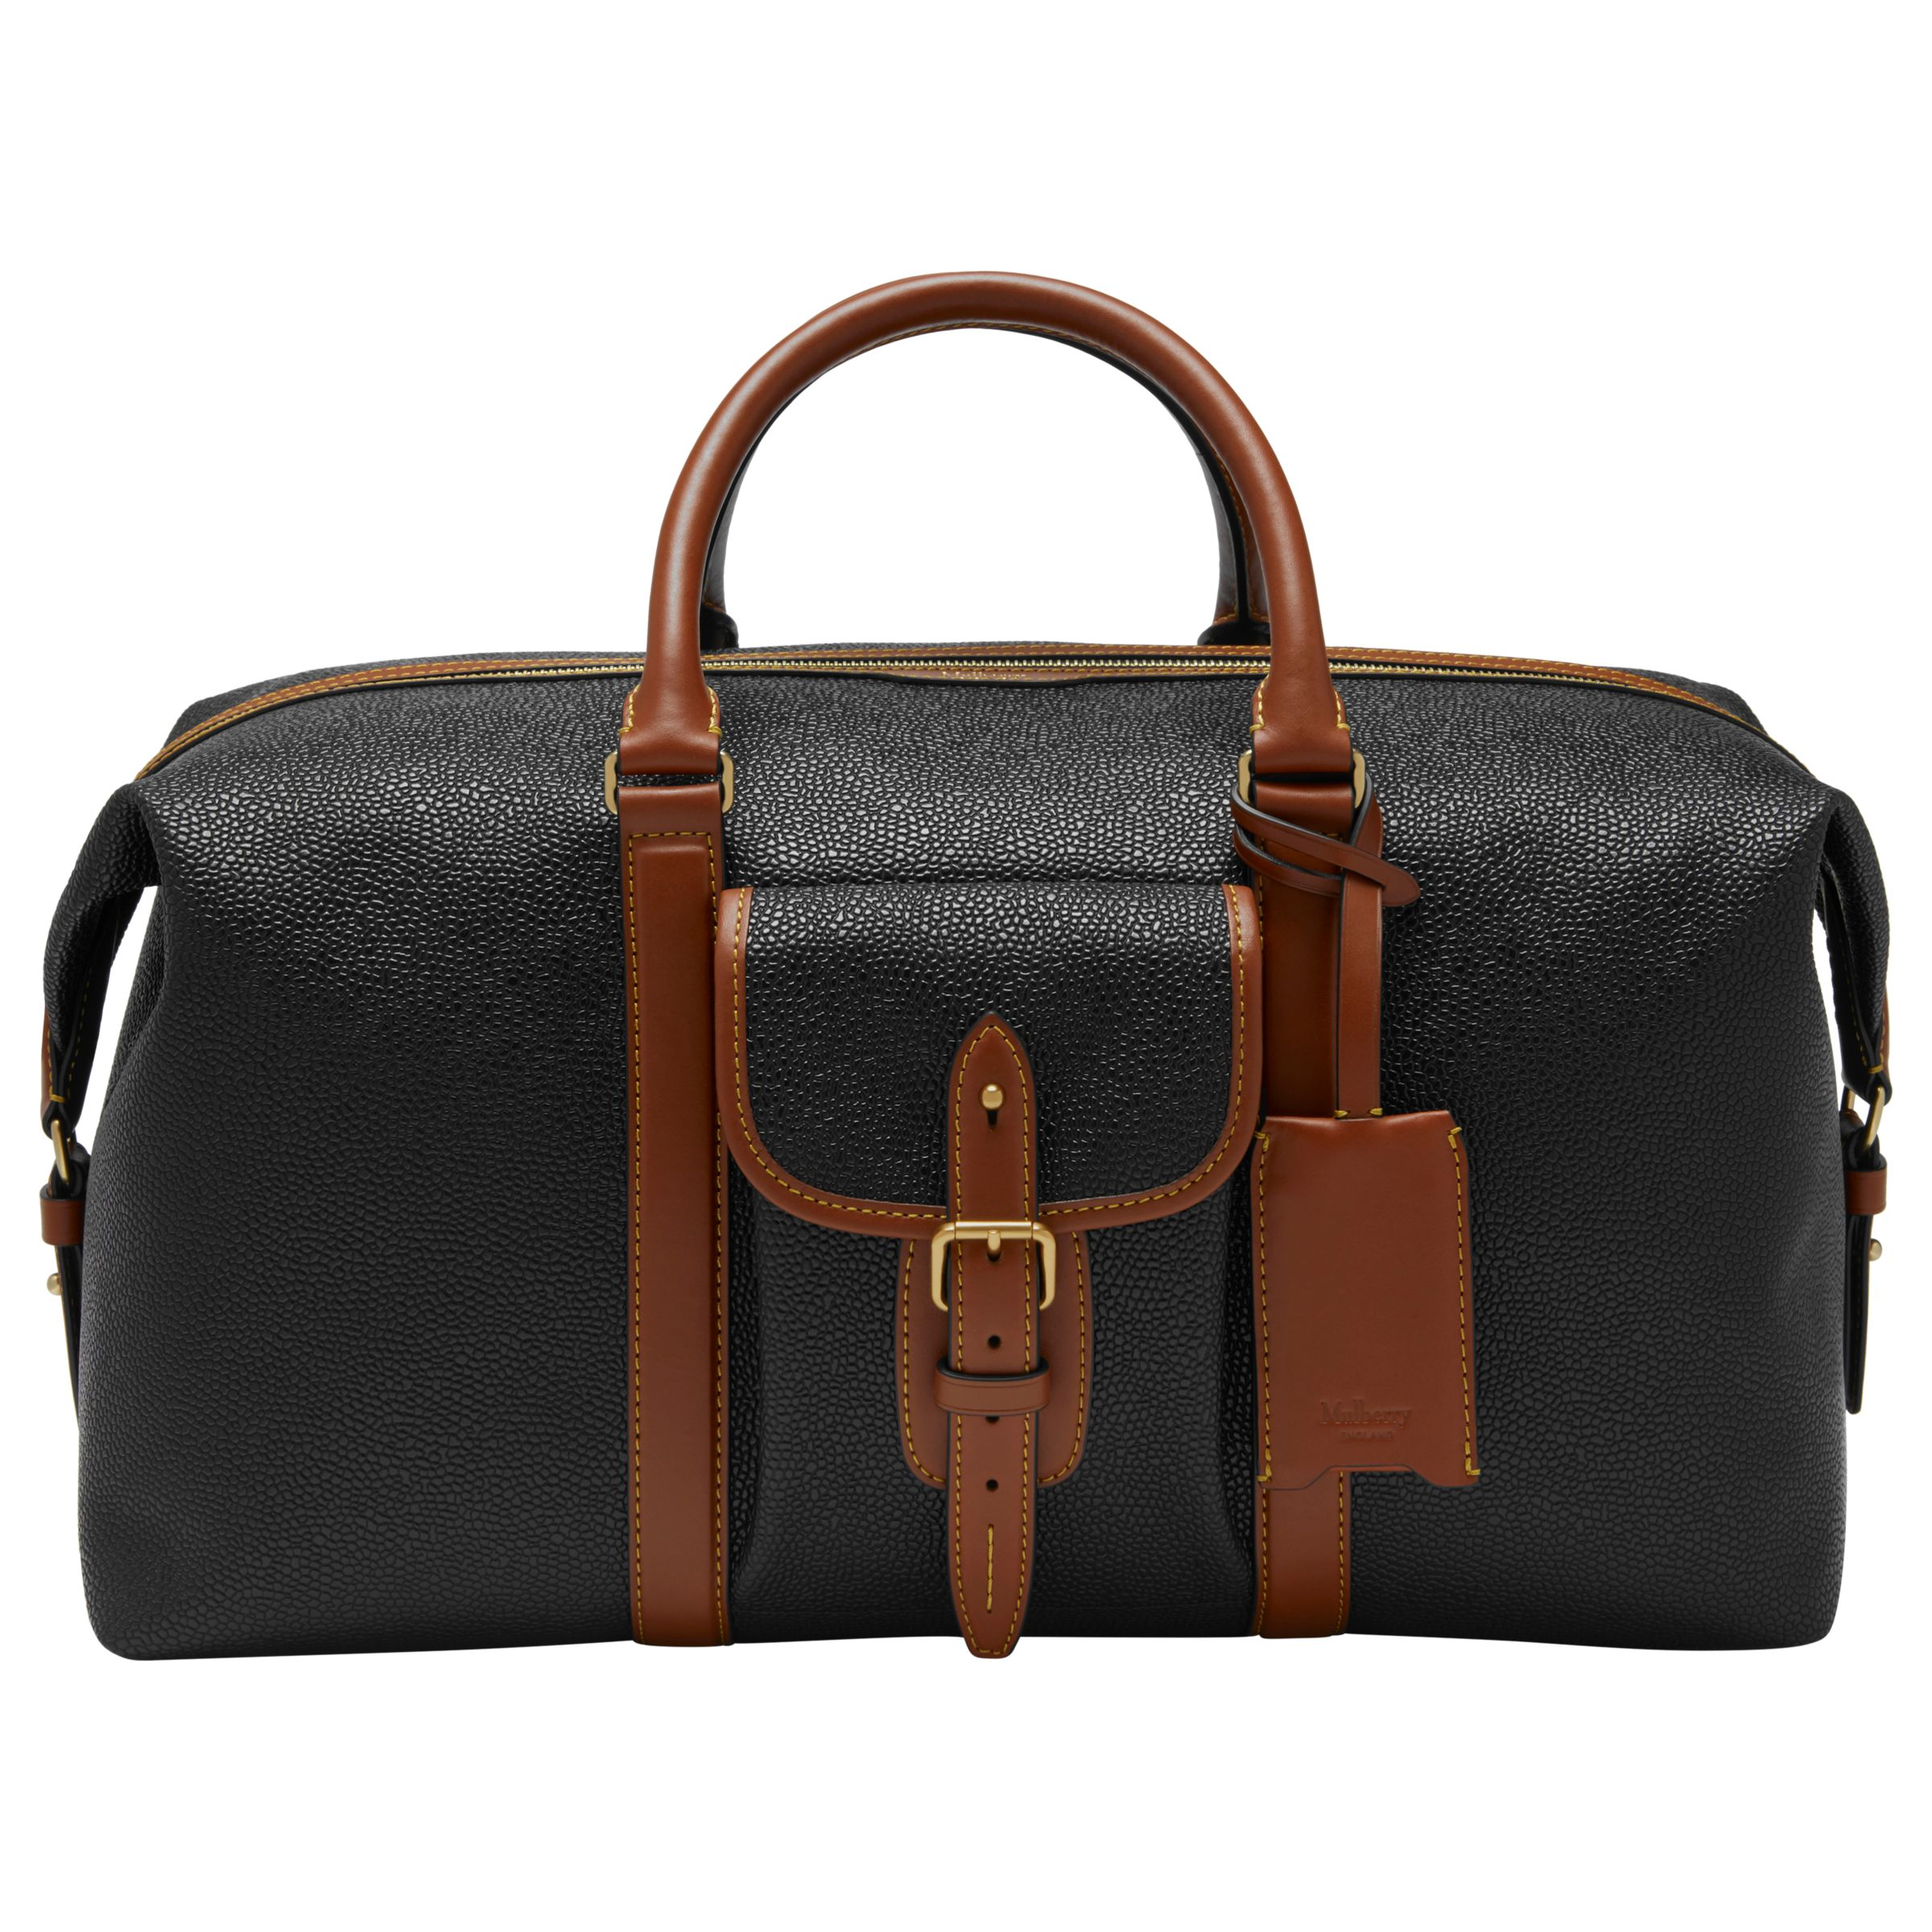 0a57b989b163 ... wholesale mulberry heritage scotchgrain weekend bag black at john lewis  partners f898d 11e41 ...